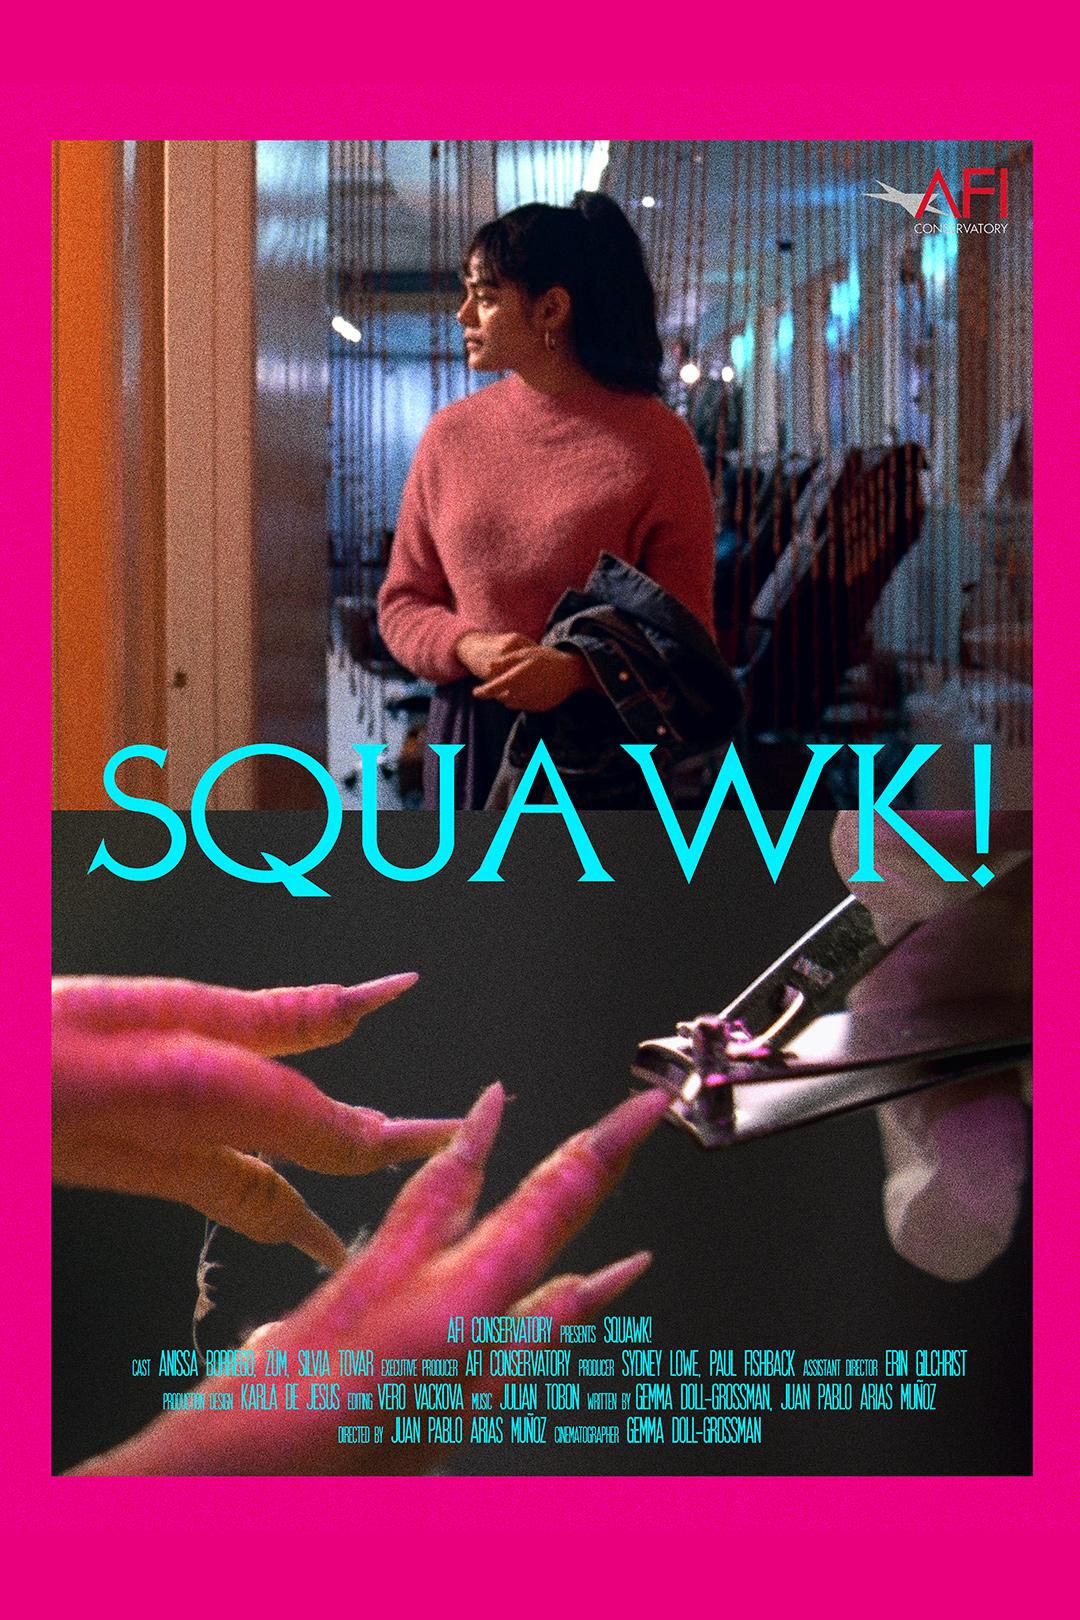 Squawk_Poster_(grainy) - Juan Pablo Arias Muñoz